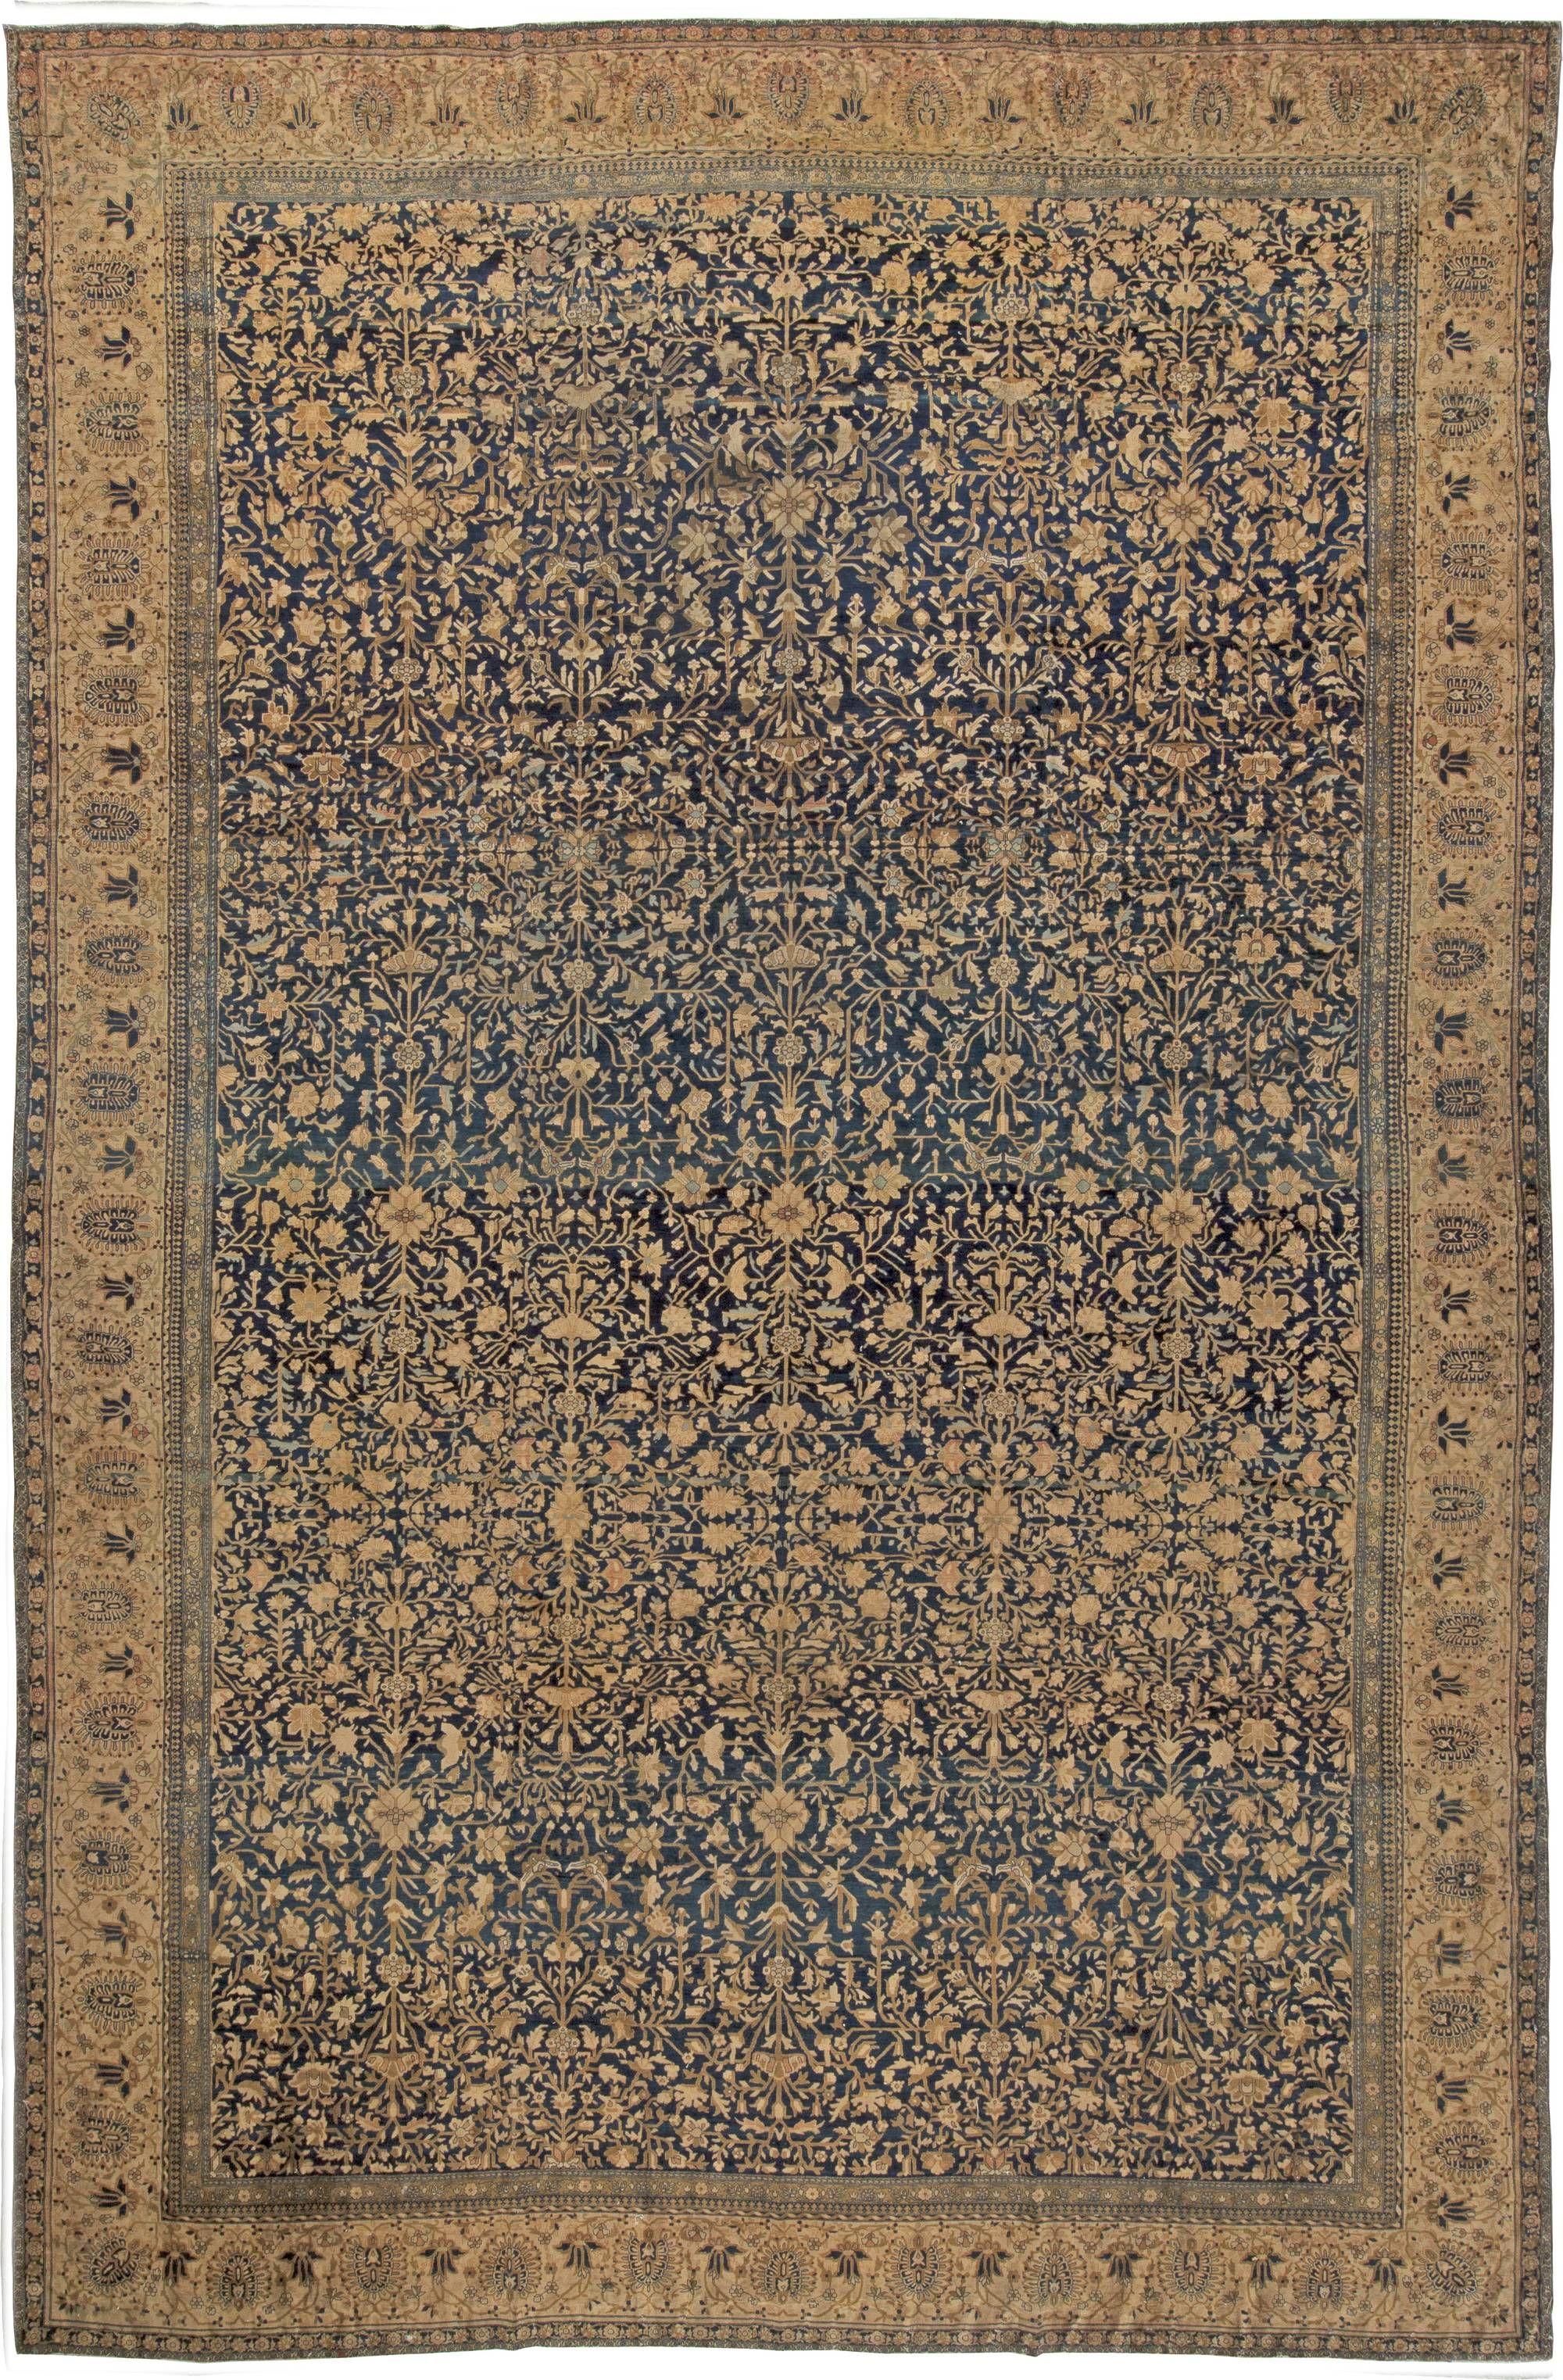 Vintage Persian Kashan Rug Persian Rugs For Sale Kashan Rug Persian Rug Designs